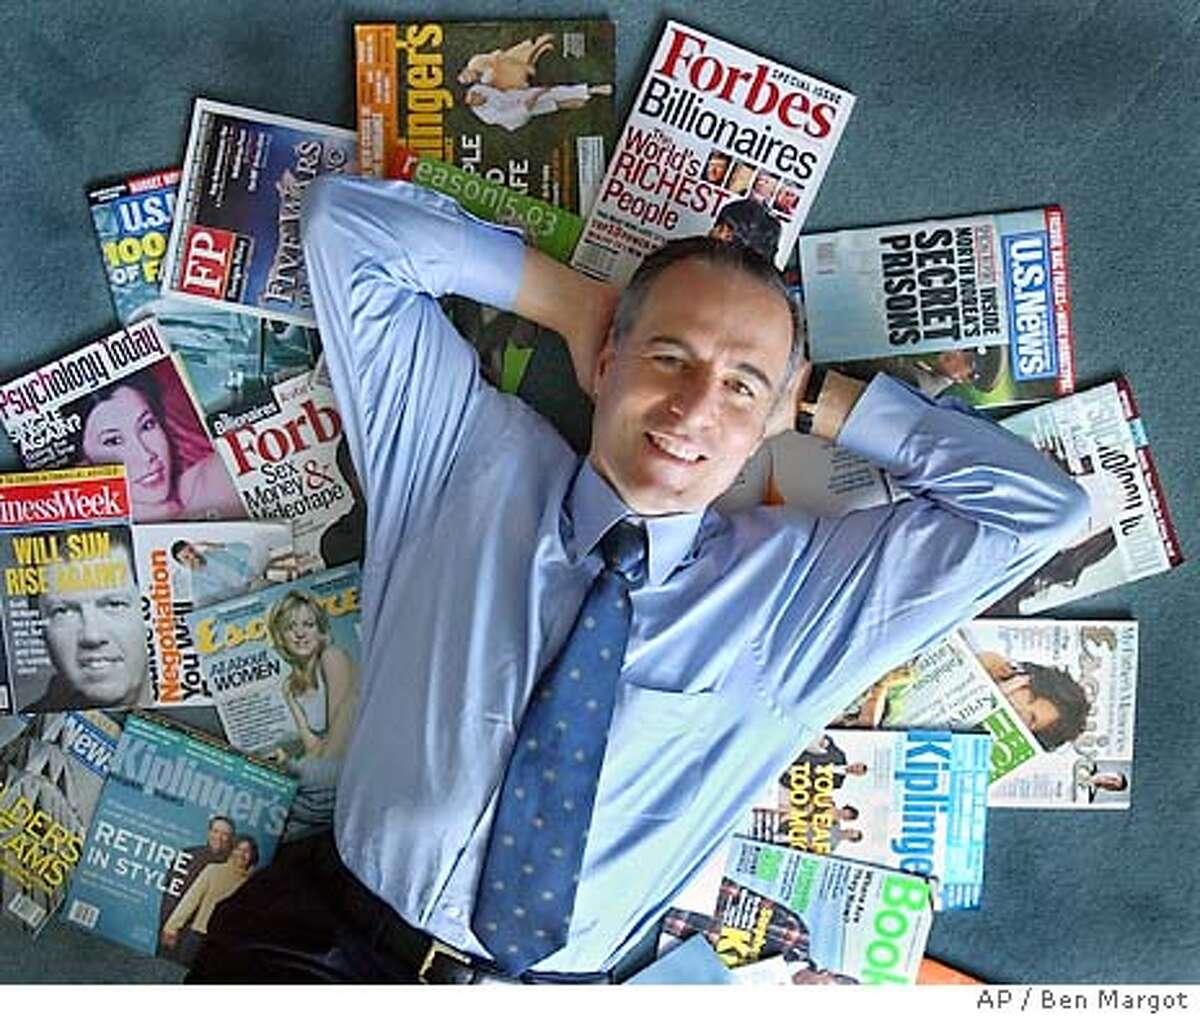 07/30/03 | Color | 5star | full | b1 | Business | er 6273 | BORDERS KEEPMEDIA